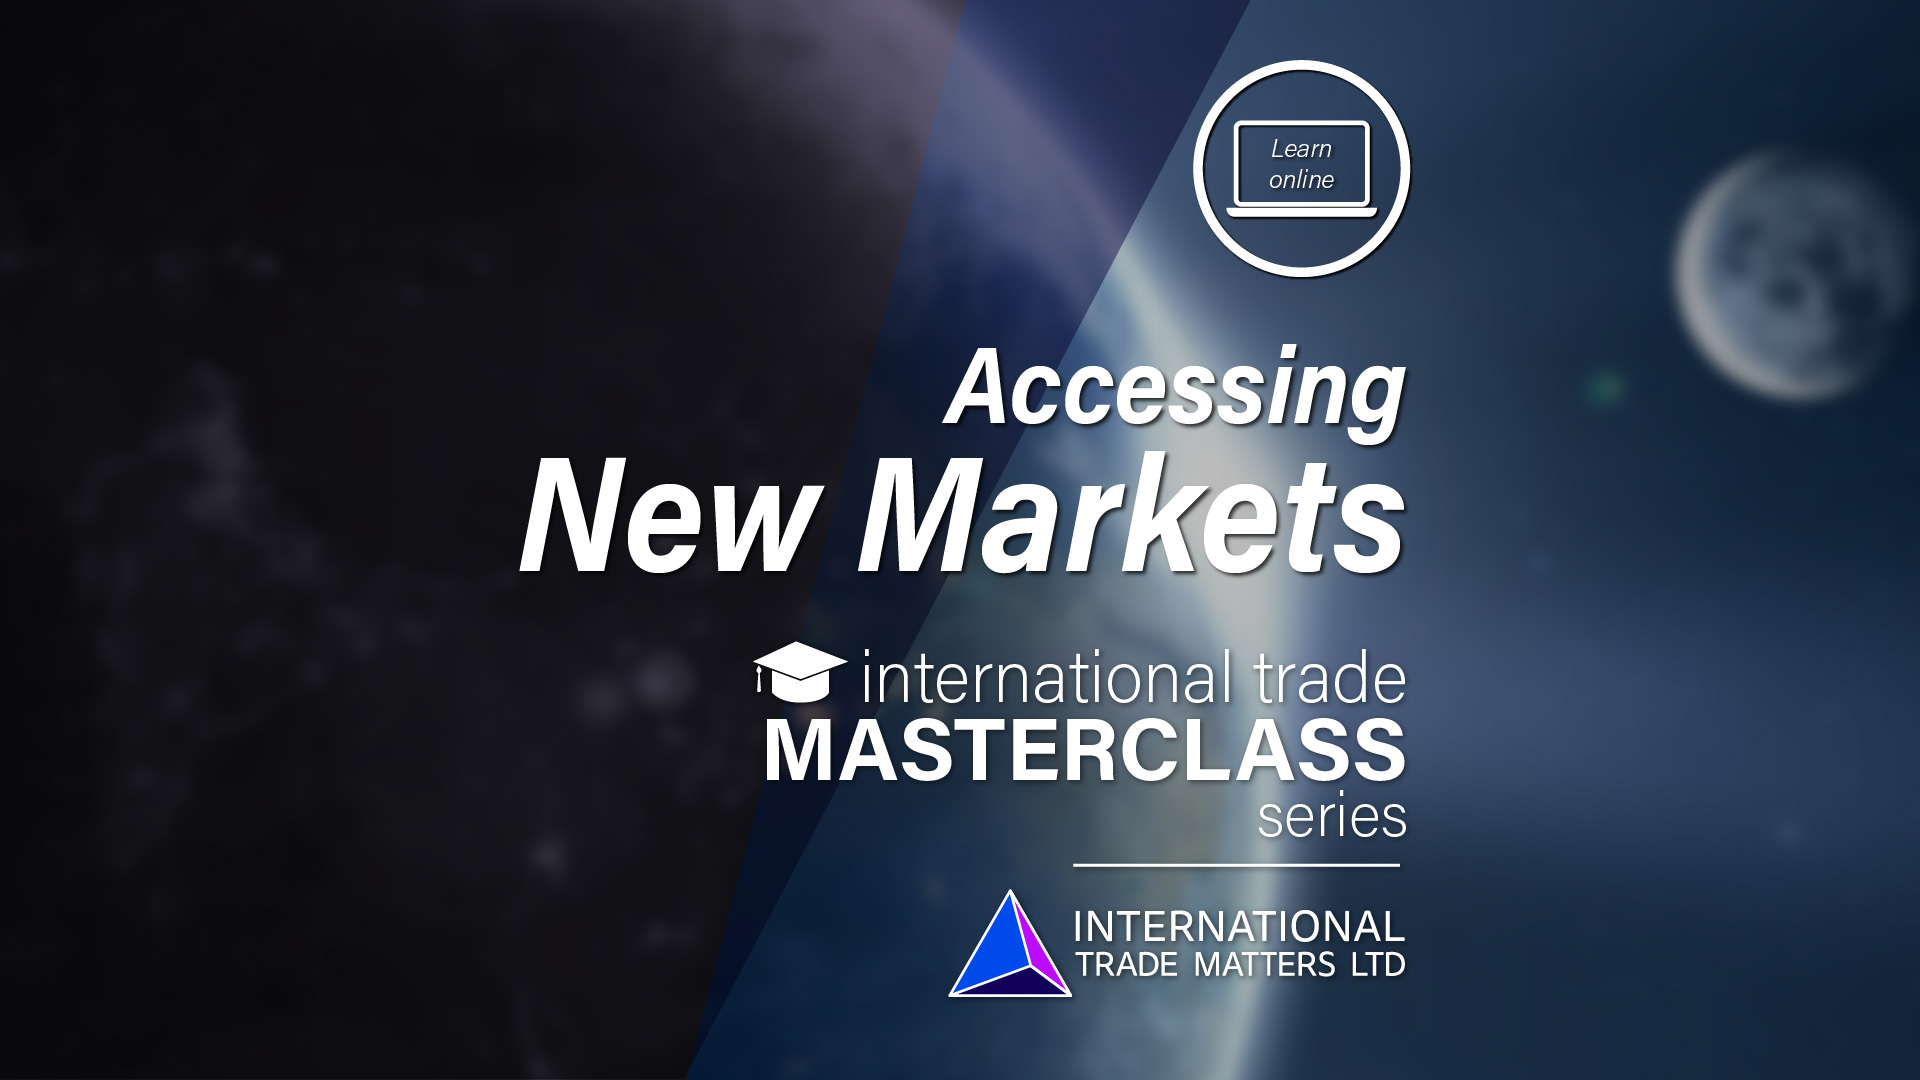 International Trade Masterclass - Accessing New Markets